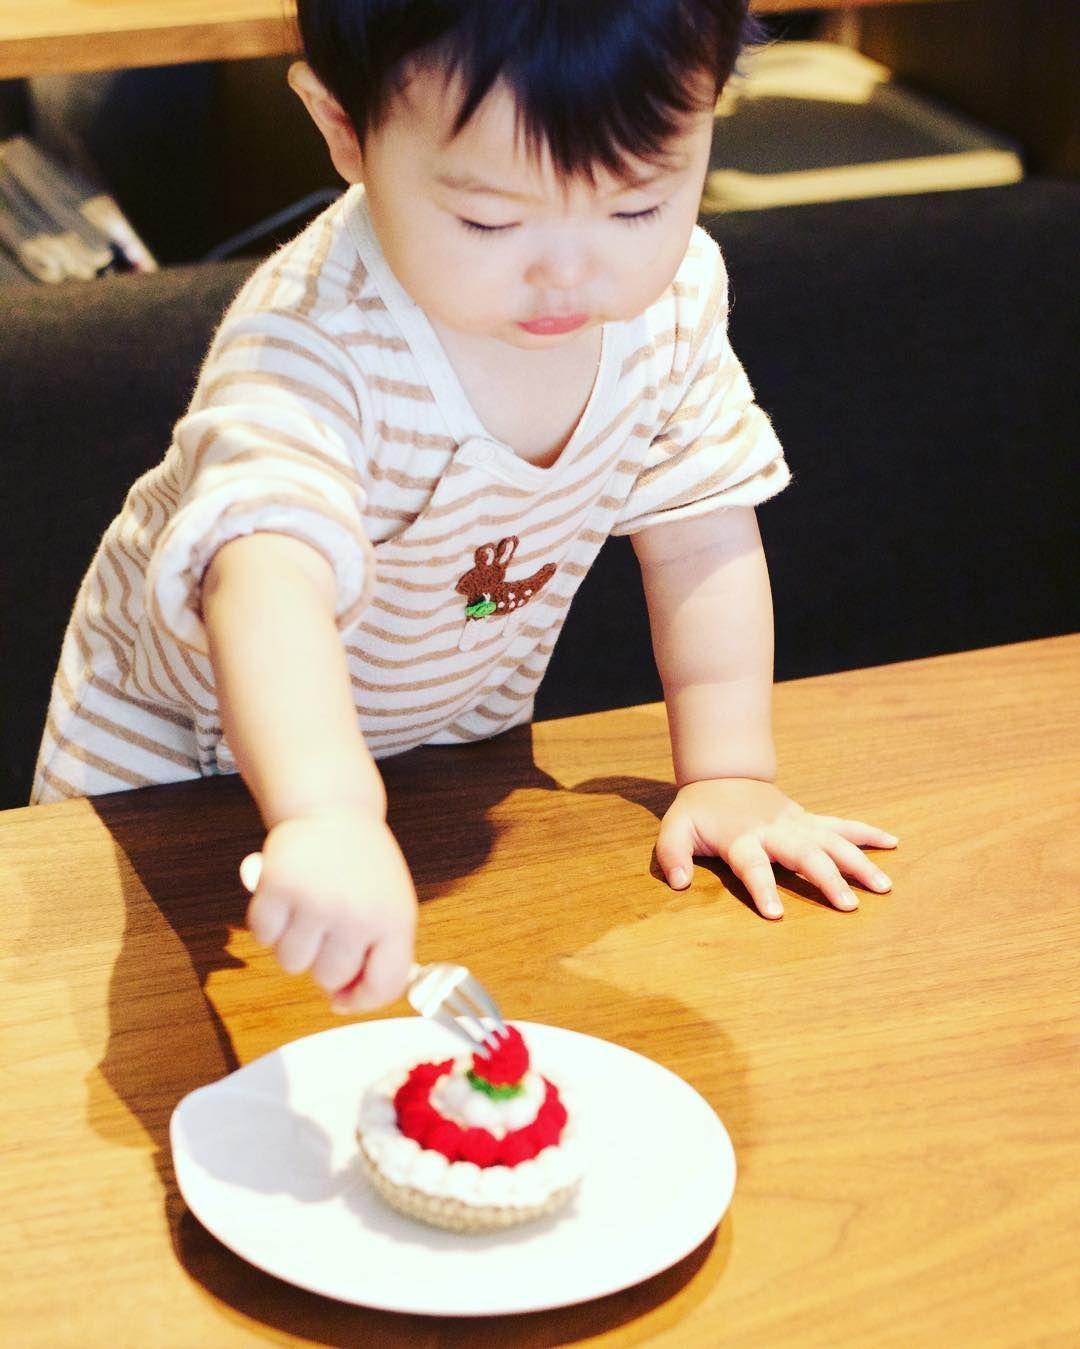 soboro_hijiki:: #手作り  #handmade  #タルト  #ケーキ  #cake #あみぐるみ #amigurumi #2015年生まれ #3月生まれ #love #cute #girl #女の子ママ #女の子 #親バカ #かわいい #tokyo #japan #mamagirl #1歳